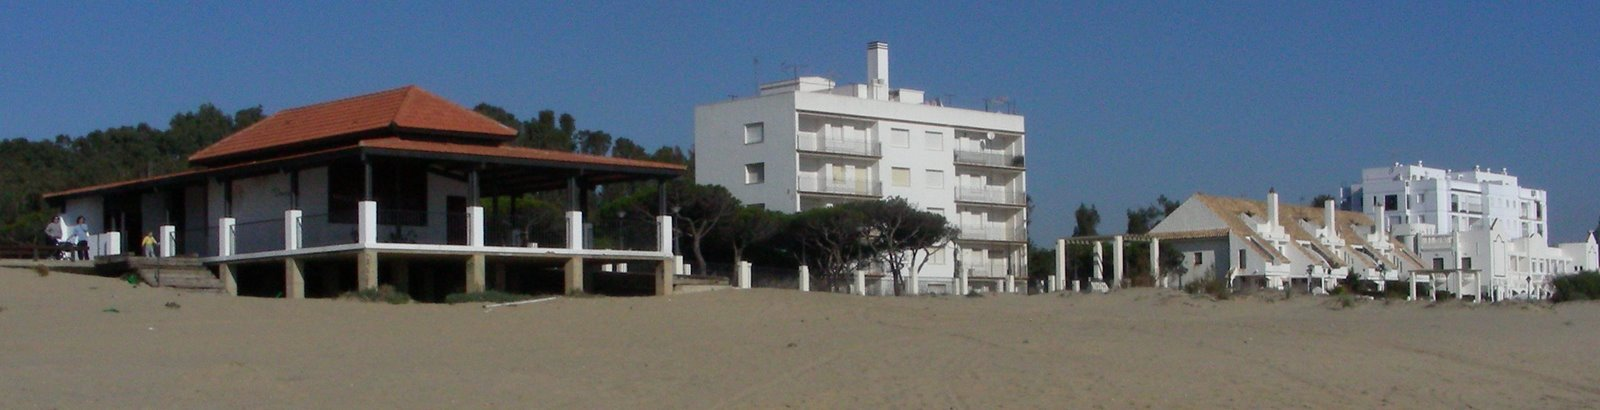 Playa Central, en Isla Cristina